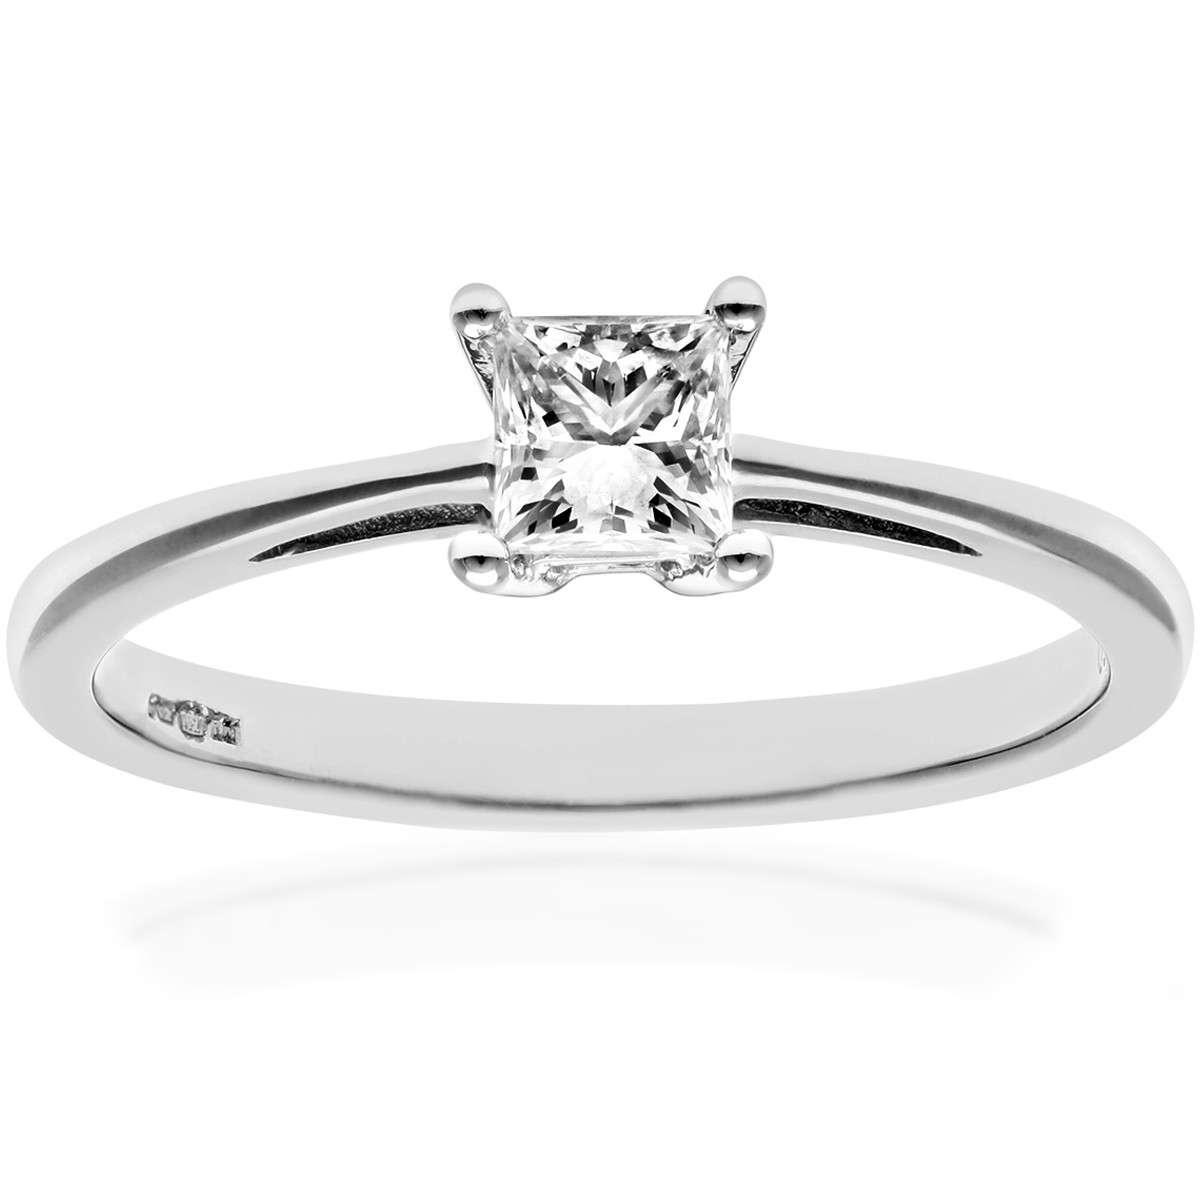 18CT WHITE GOLD 0.33CT DIAMOND PRINCESS CUT RING